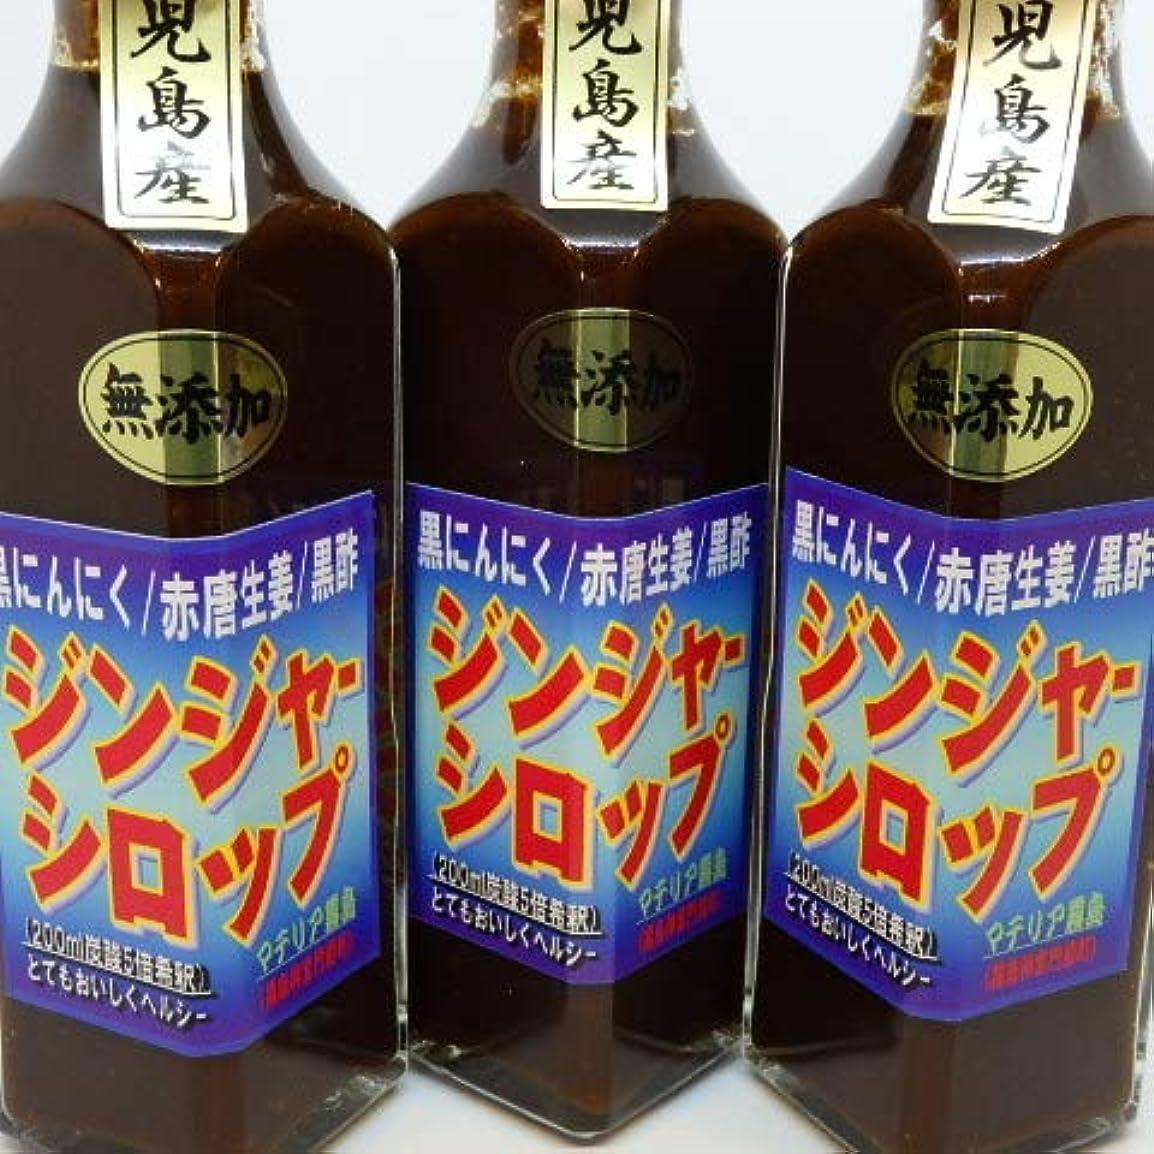 十分な不忠効率無添加健康食品/黒酢黒ジンジャ-/無添加/200ml×3組90日分¥10,800